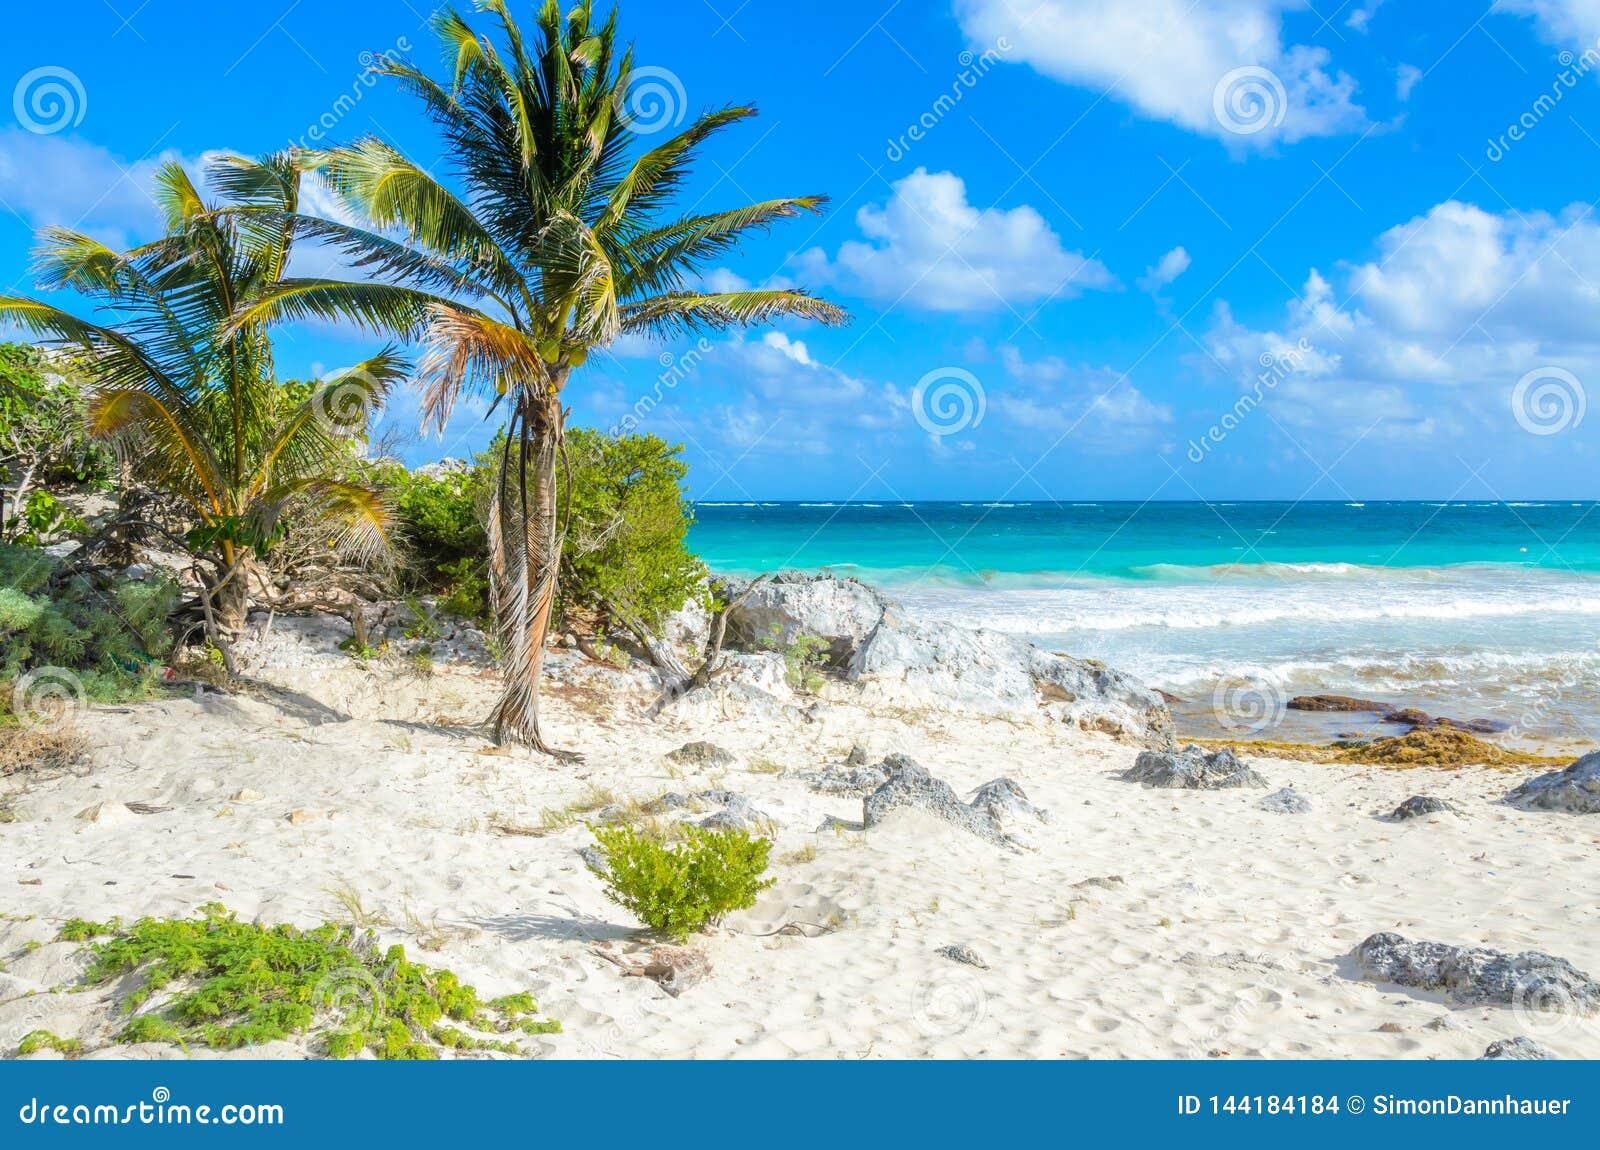 Paradise beach of Tulum, Quintana Roo, Mexico. Mayan ruins of Tulum at tropical coast